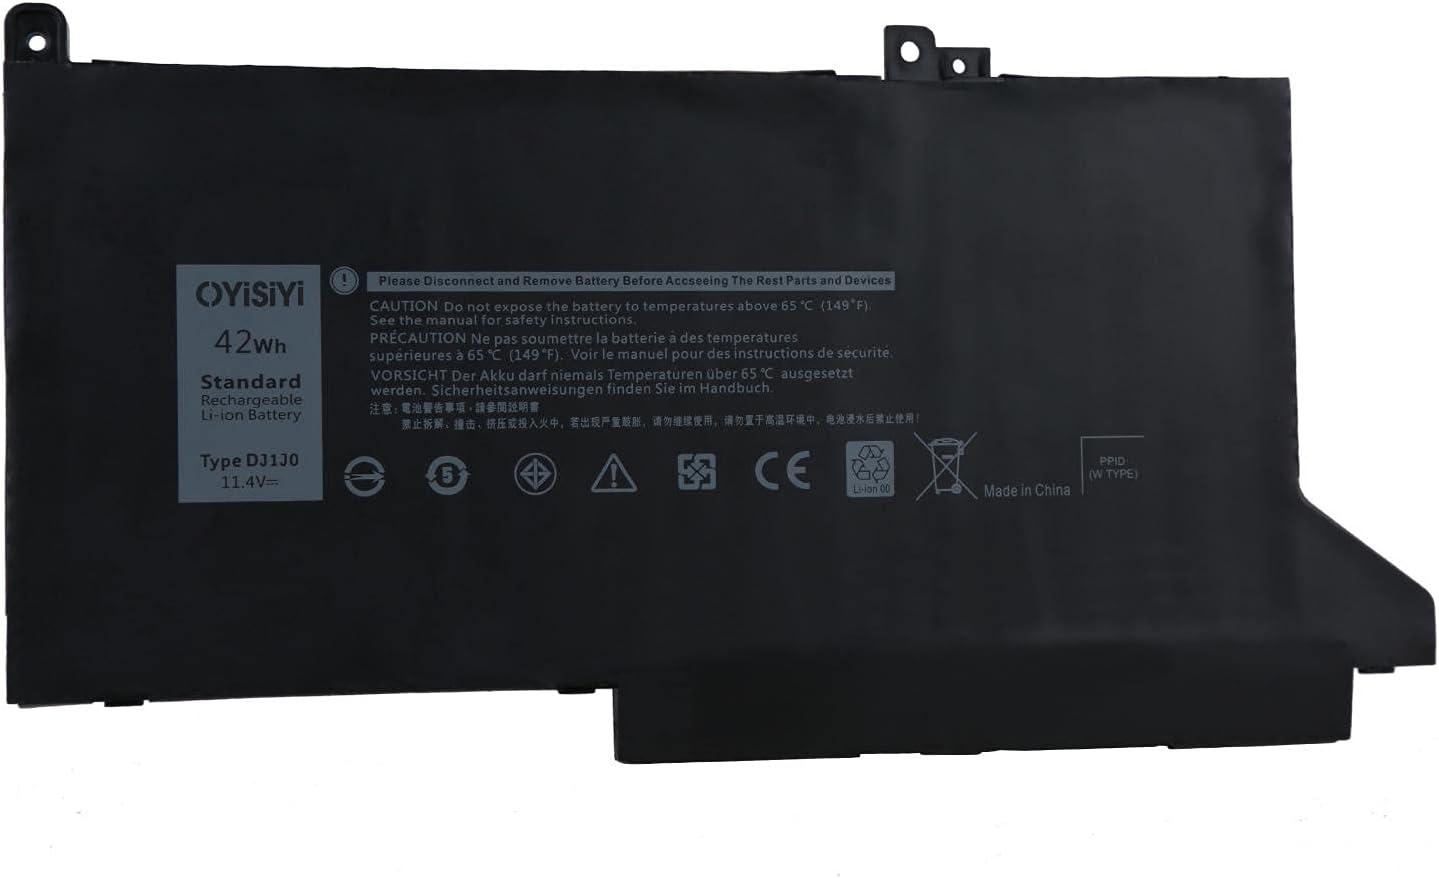 OYISIYI DJ1J0 Laptop Battery for Dell Latitude 12 7280 7290 E7280 E7290 13 7380 7390 E7380 E7390 14 7480 7490 E7480 E7490 Notebook 451-BBZL PGFX4 ONFOH 0G74G 11.4V 42Wh